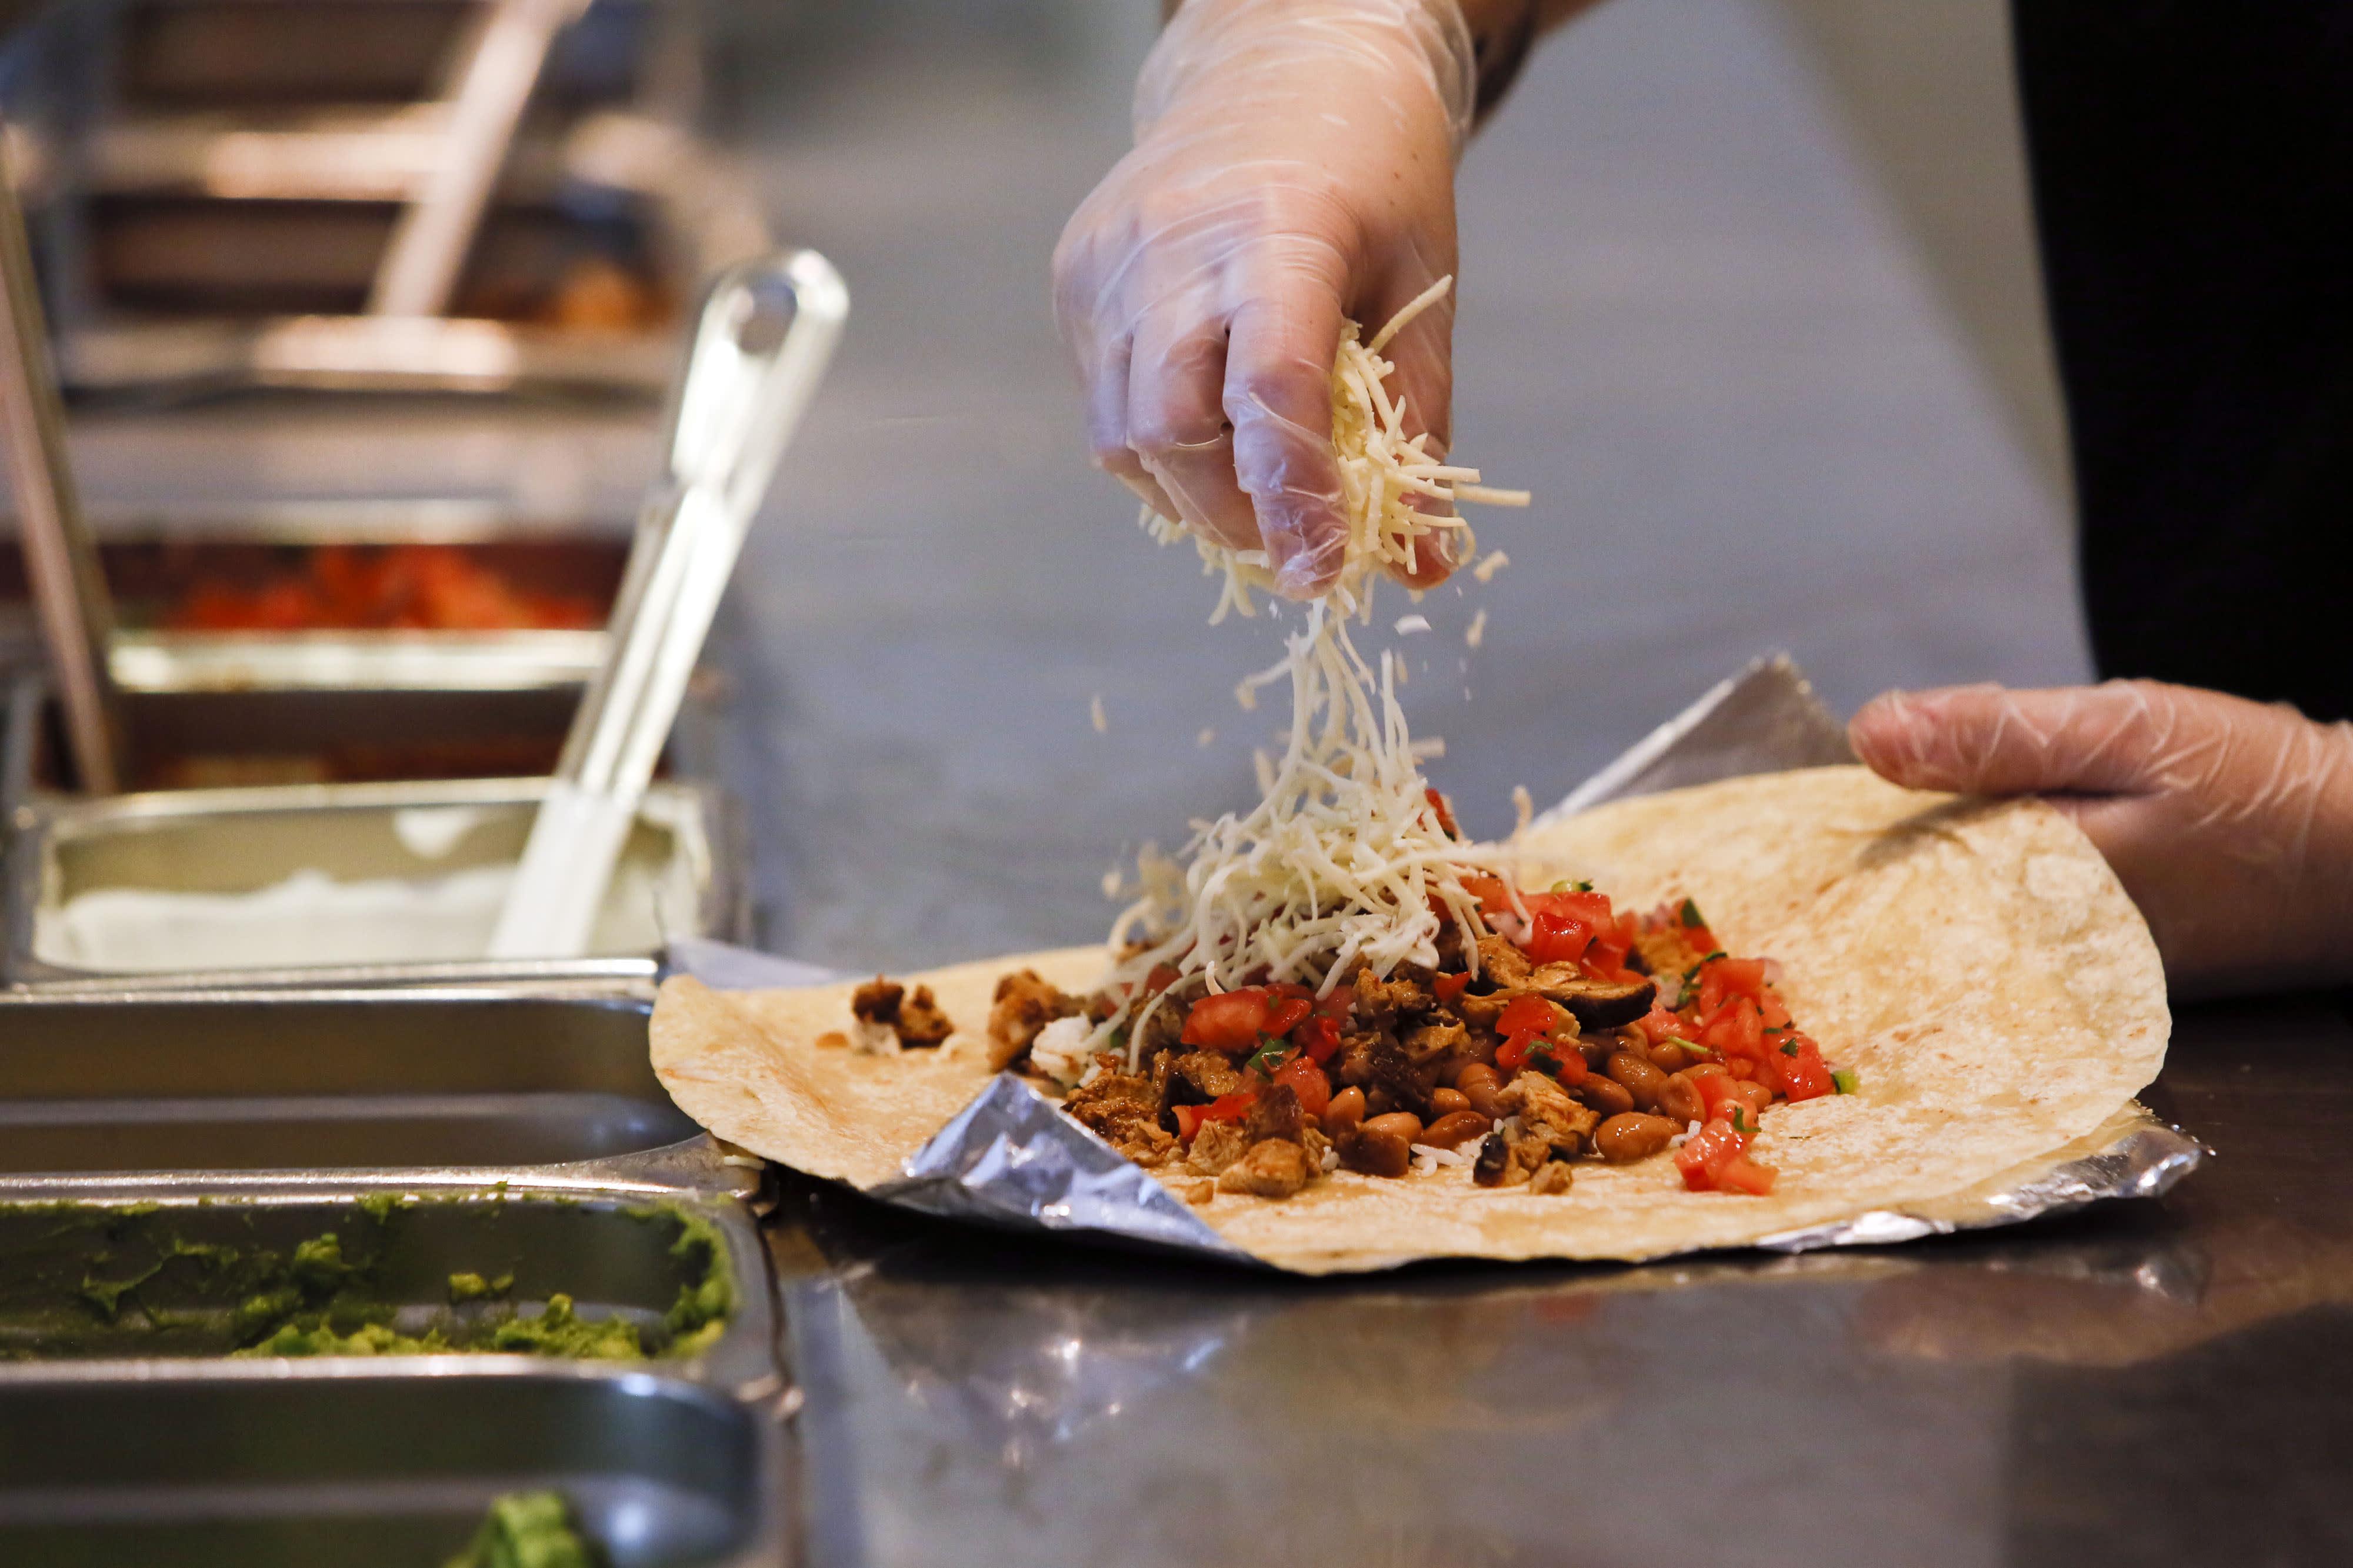 photo regarding Chipotle Printable Menu titled Chipotle exams refreshing menu: quesadilla, nachos, avocado tostada